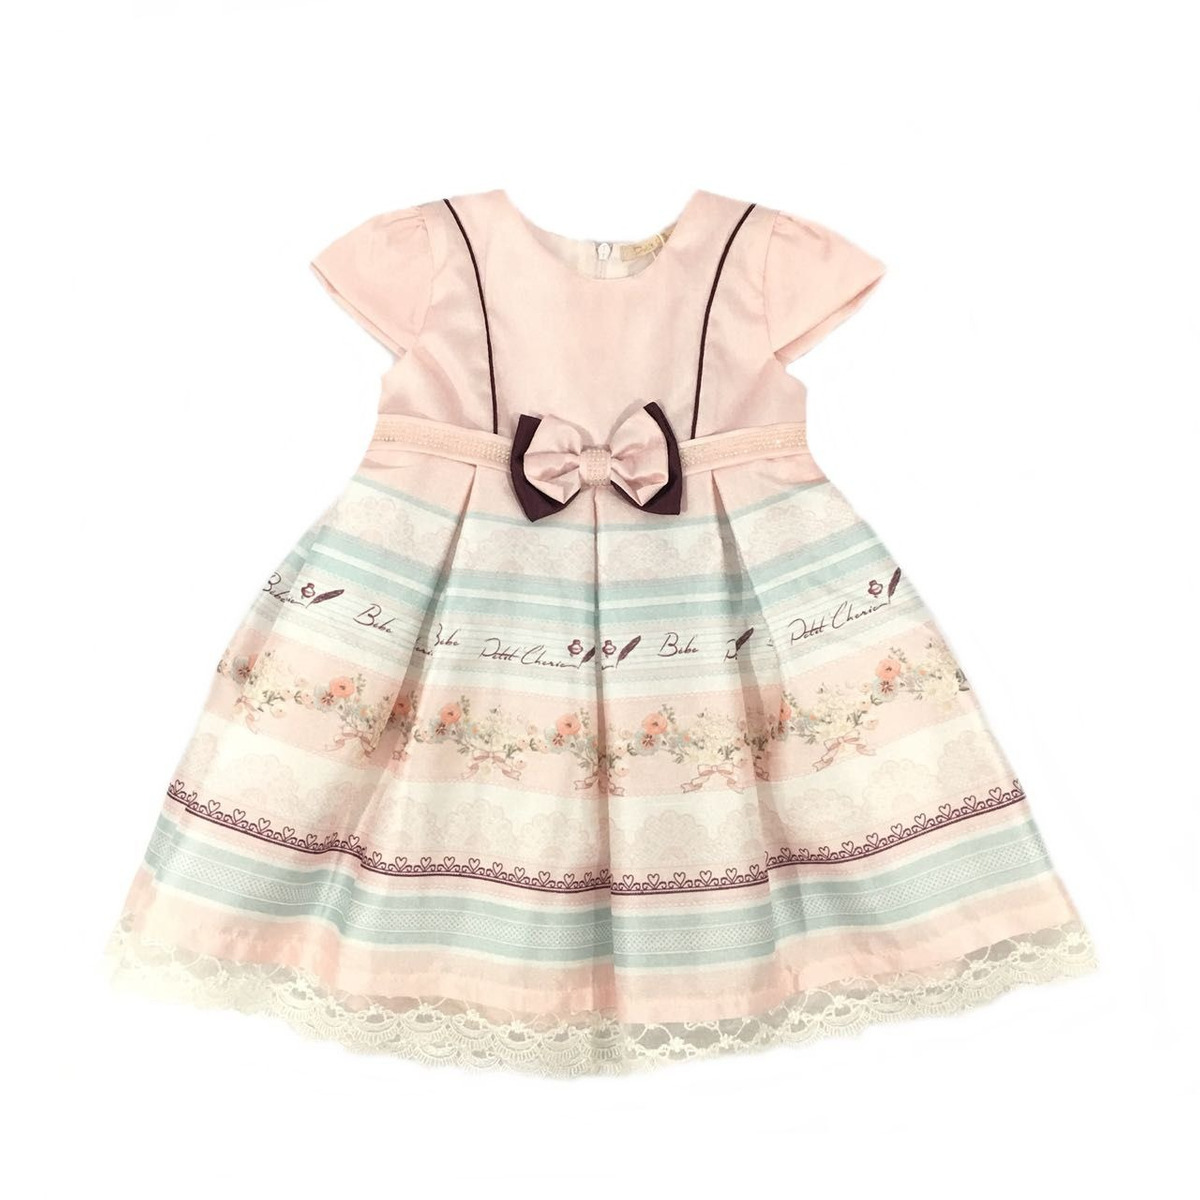 0d28f456e4 vestido petit cherie 30.12.31020. Carregando zoom.